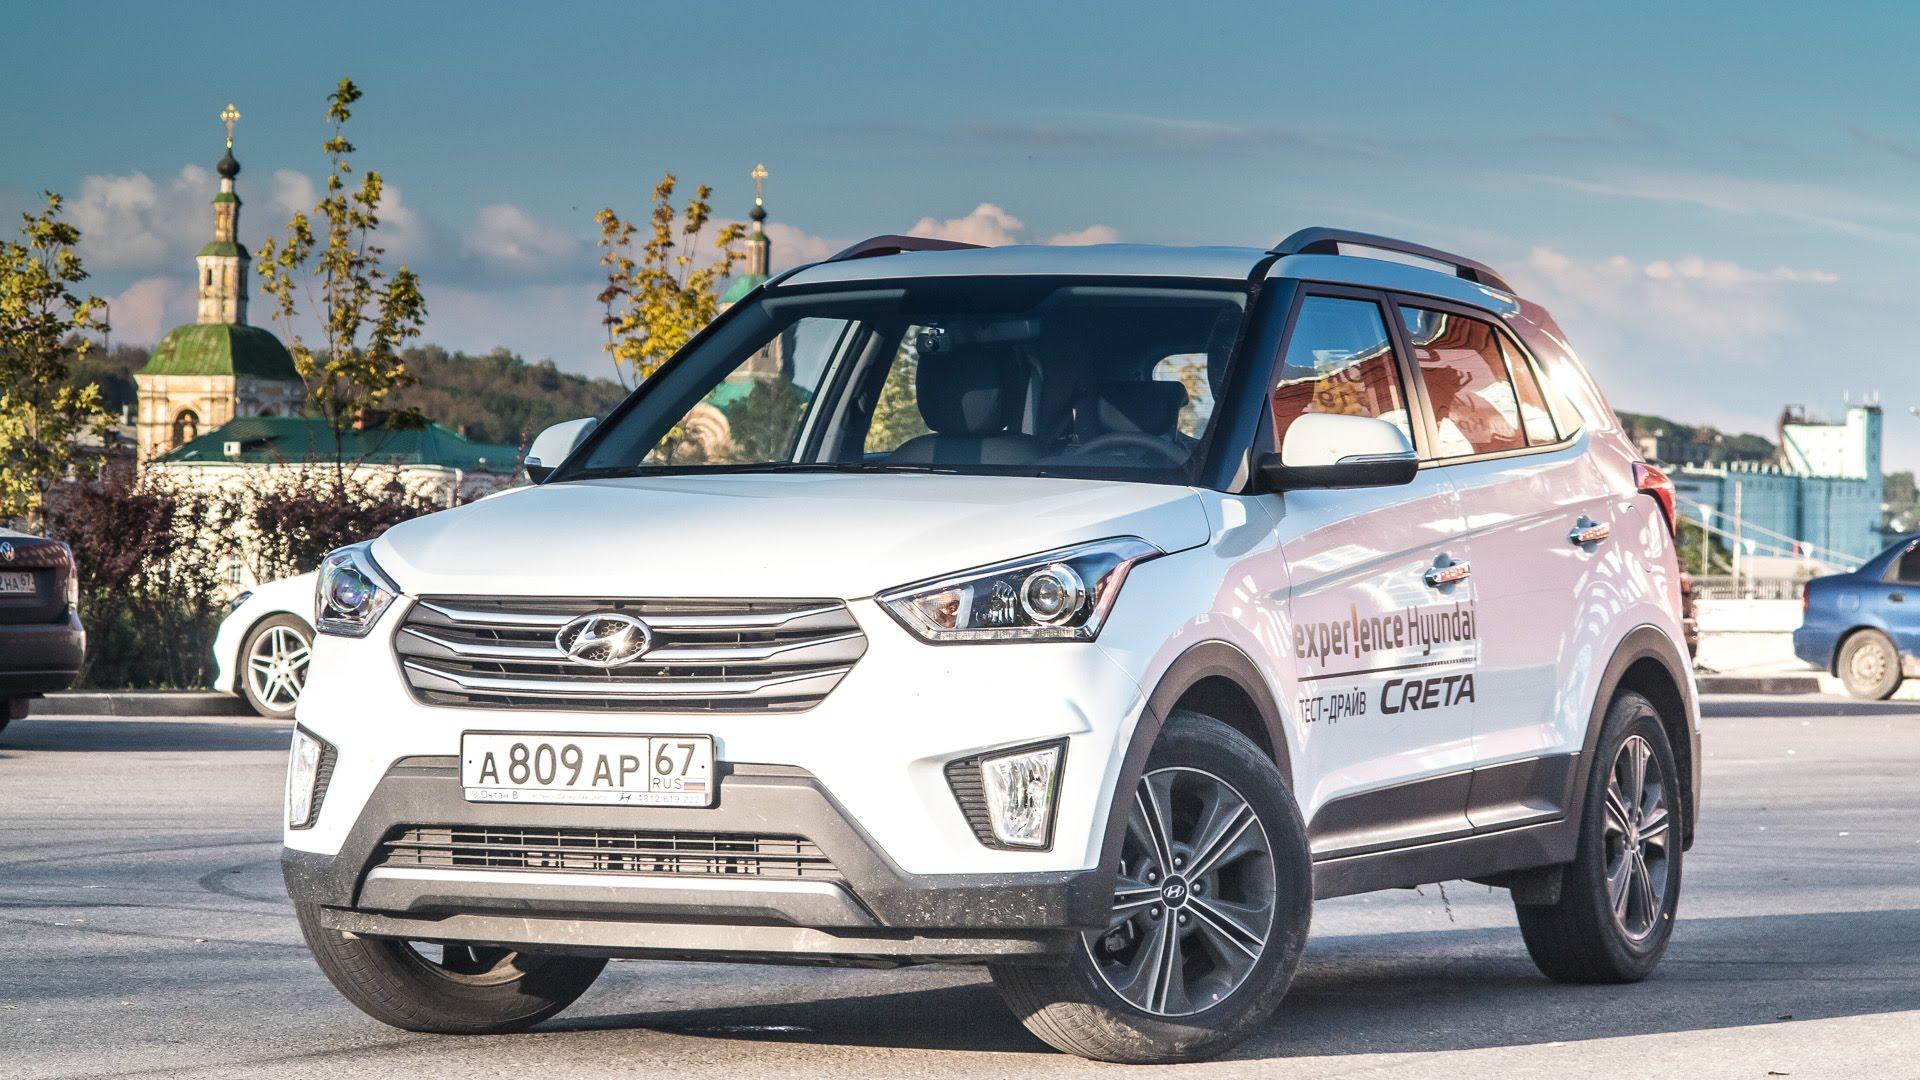 Hyundai Creta Hd Wallpapers 7wallpapers Net